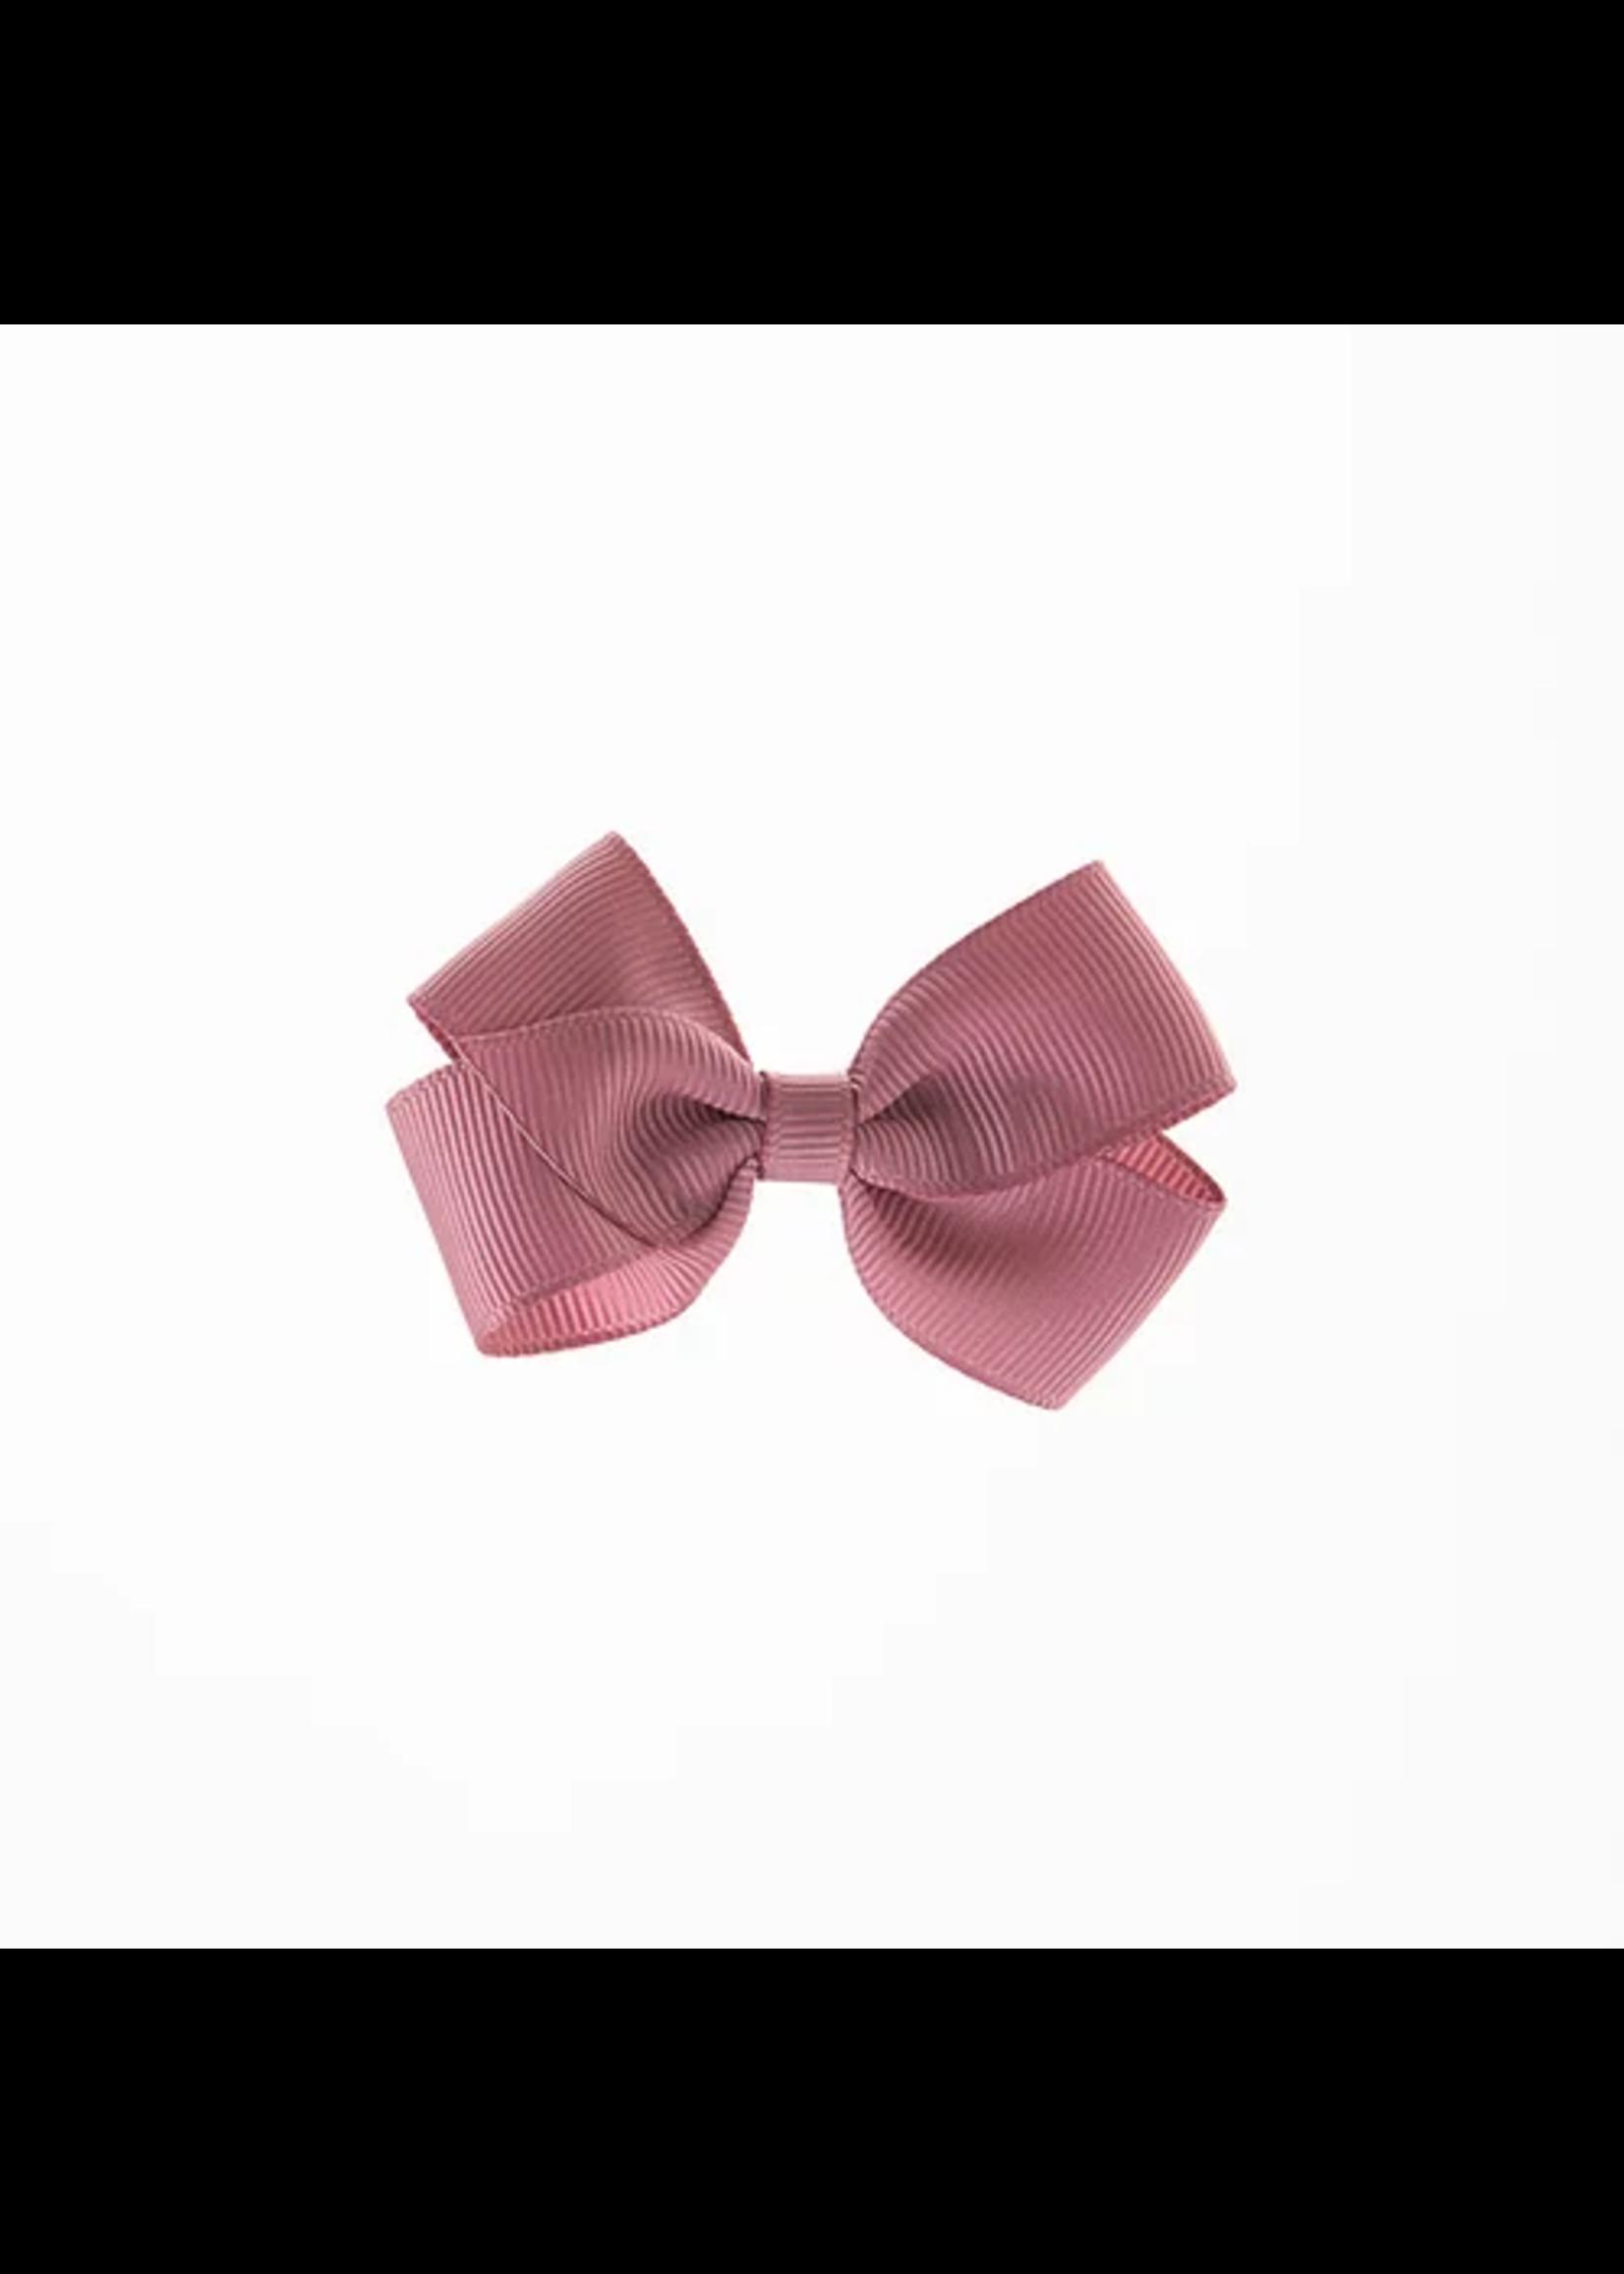 Olilia Small London Bow (Rosy Mauve)